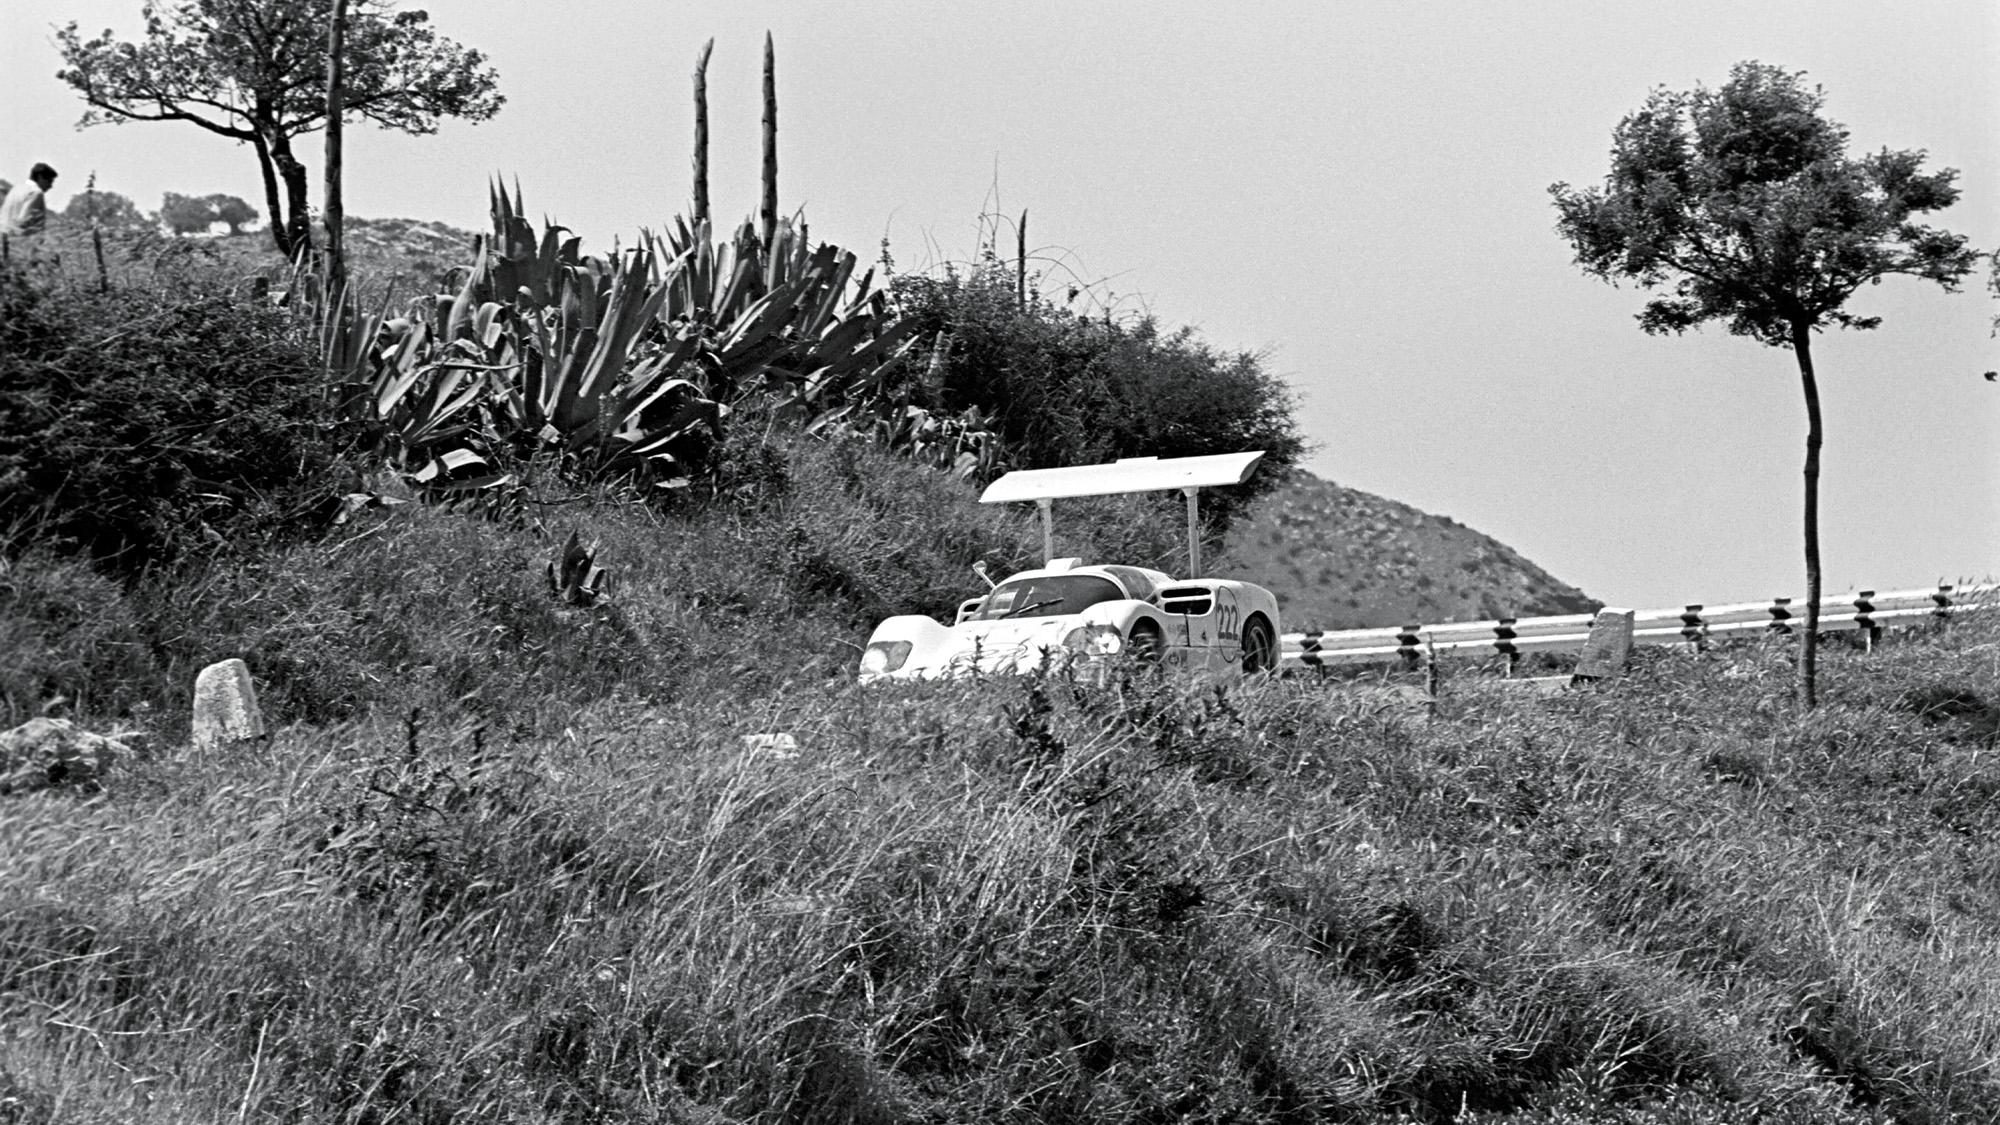 Chaparral 2F on the Targa Florio route